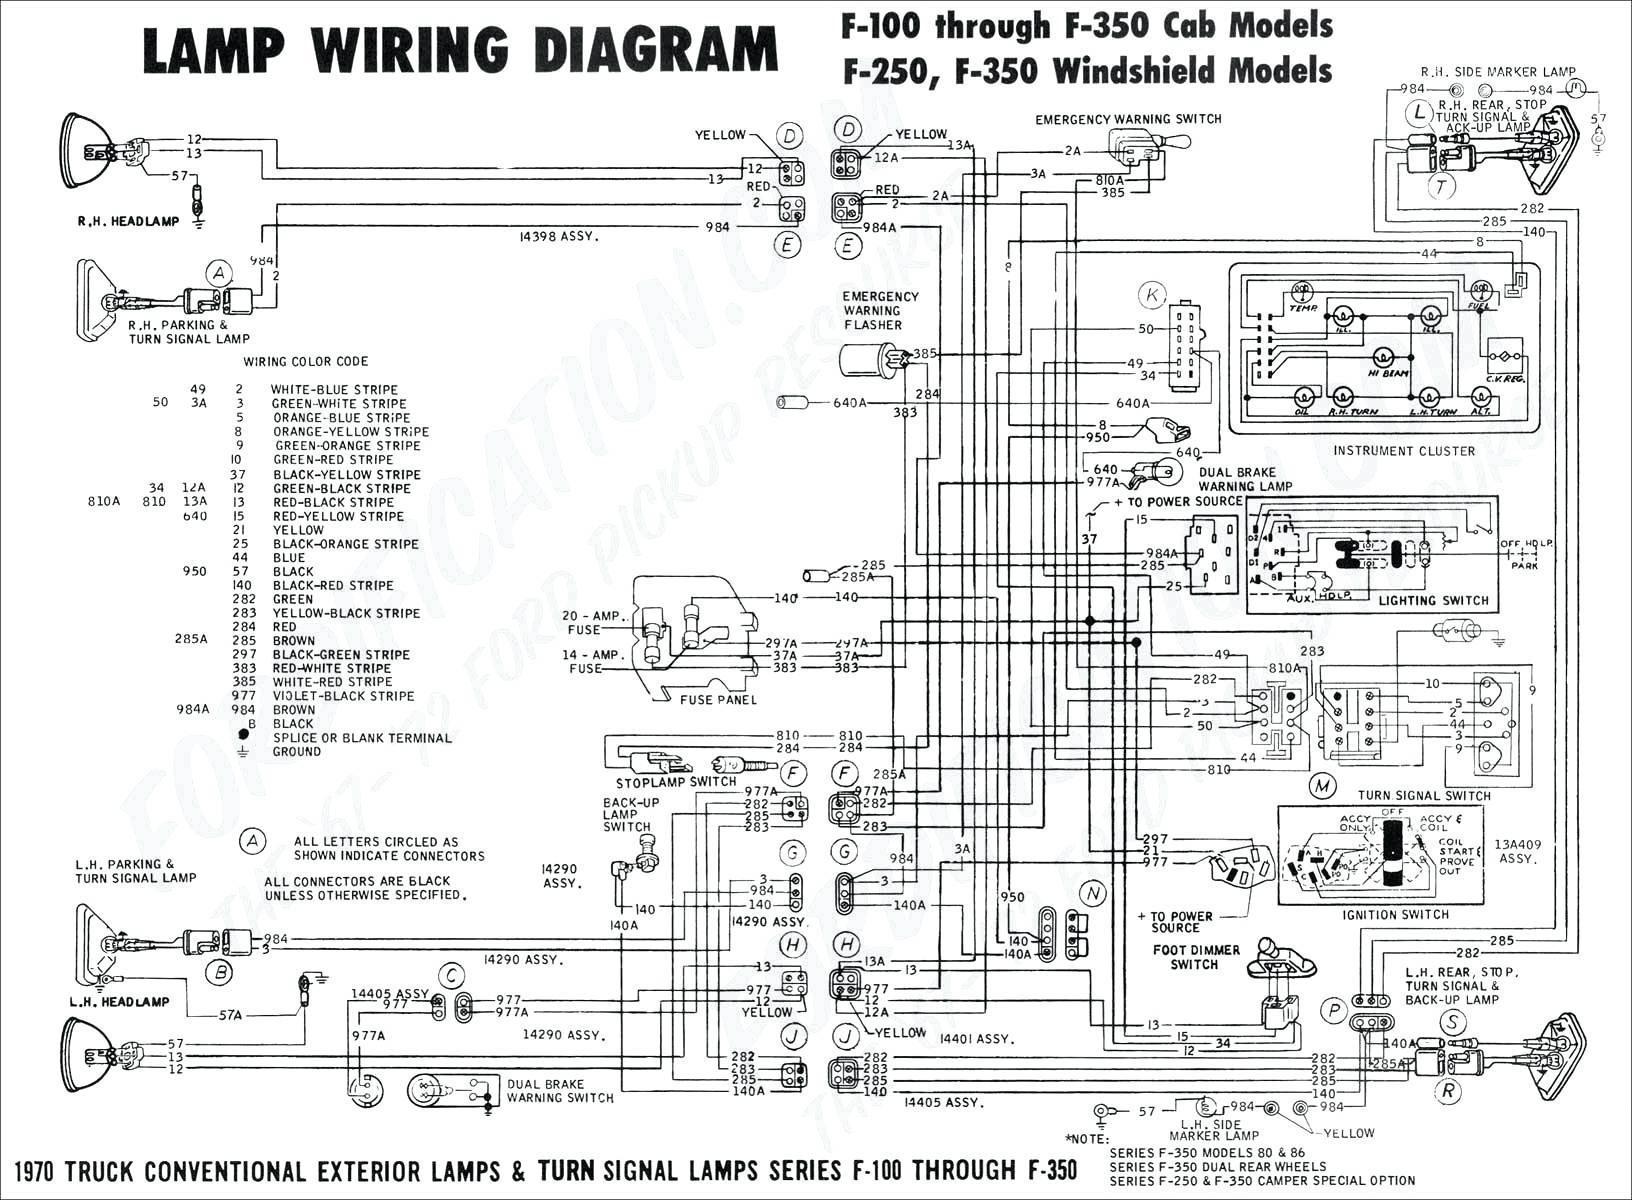 2001 Chevrolet Cavalier Fuse Box Car Wiring Diagram